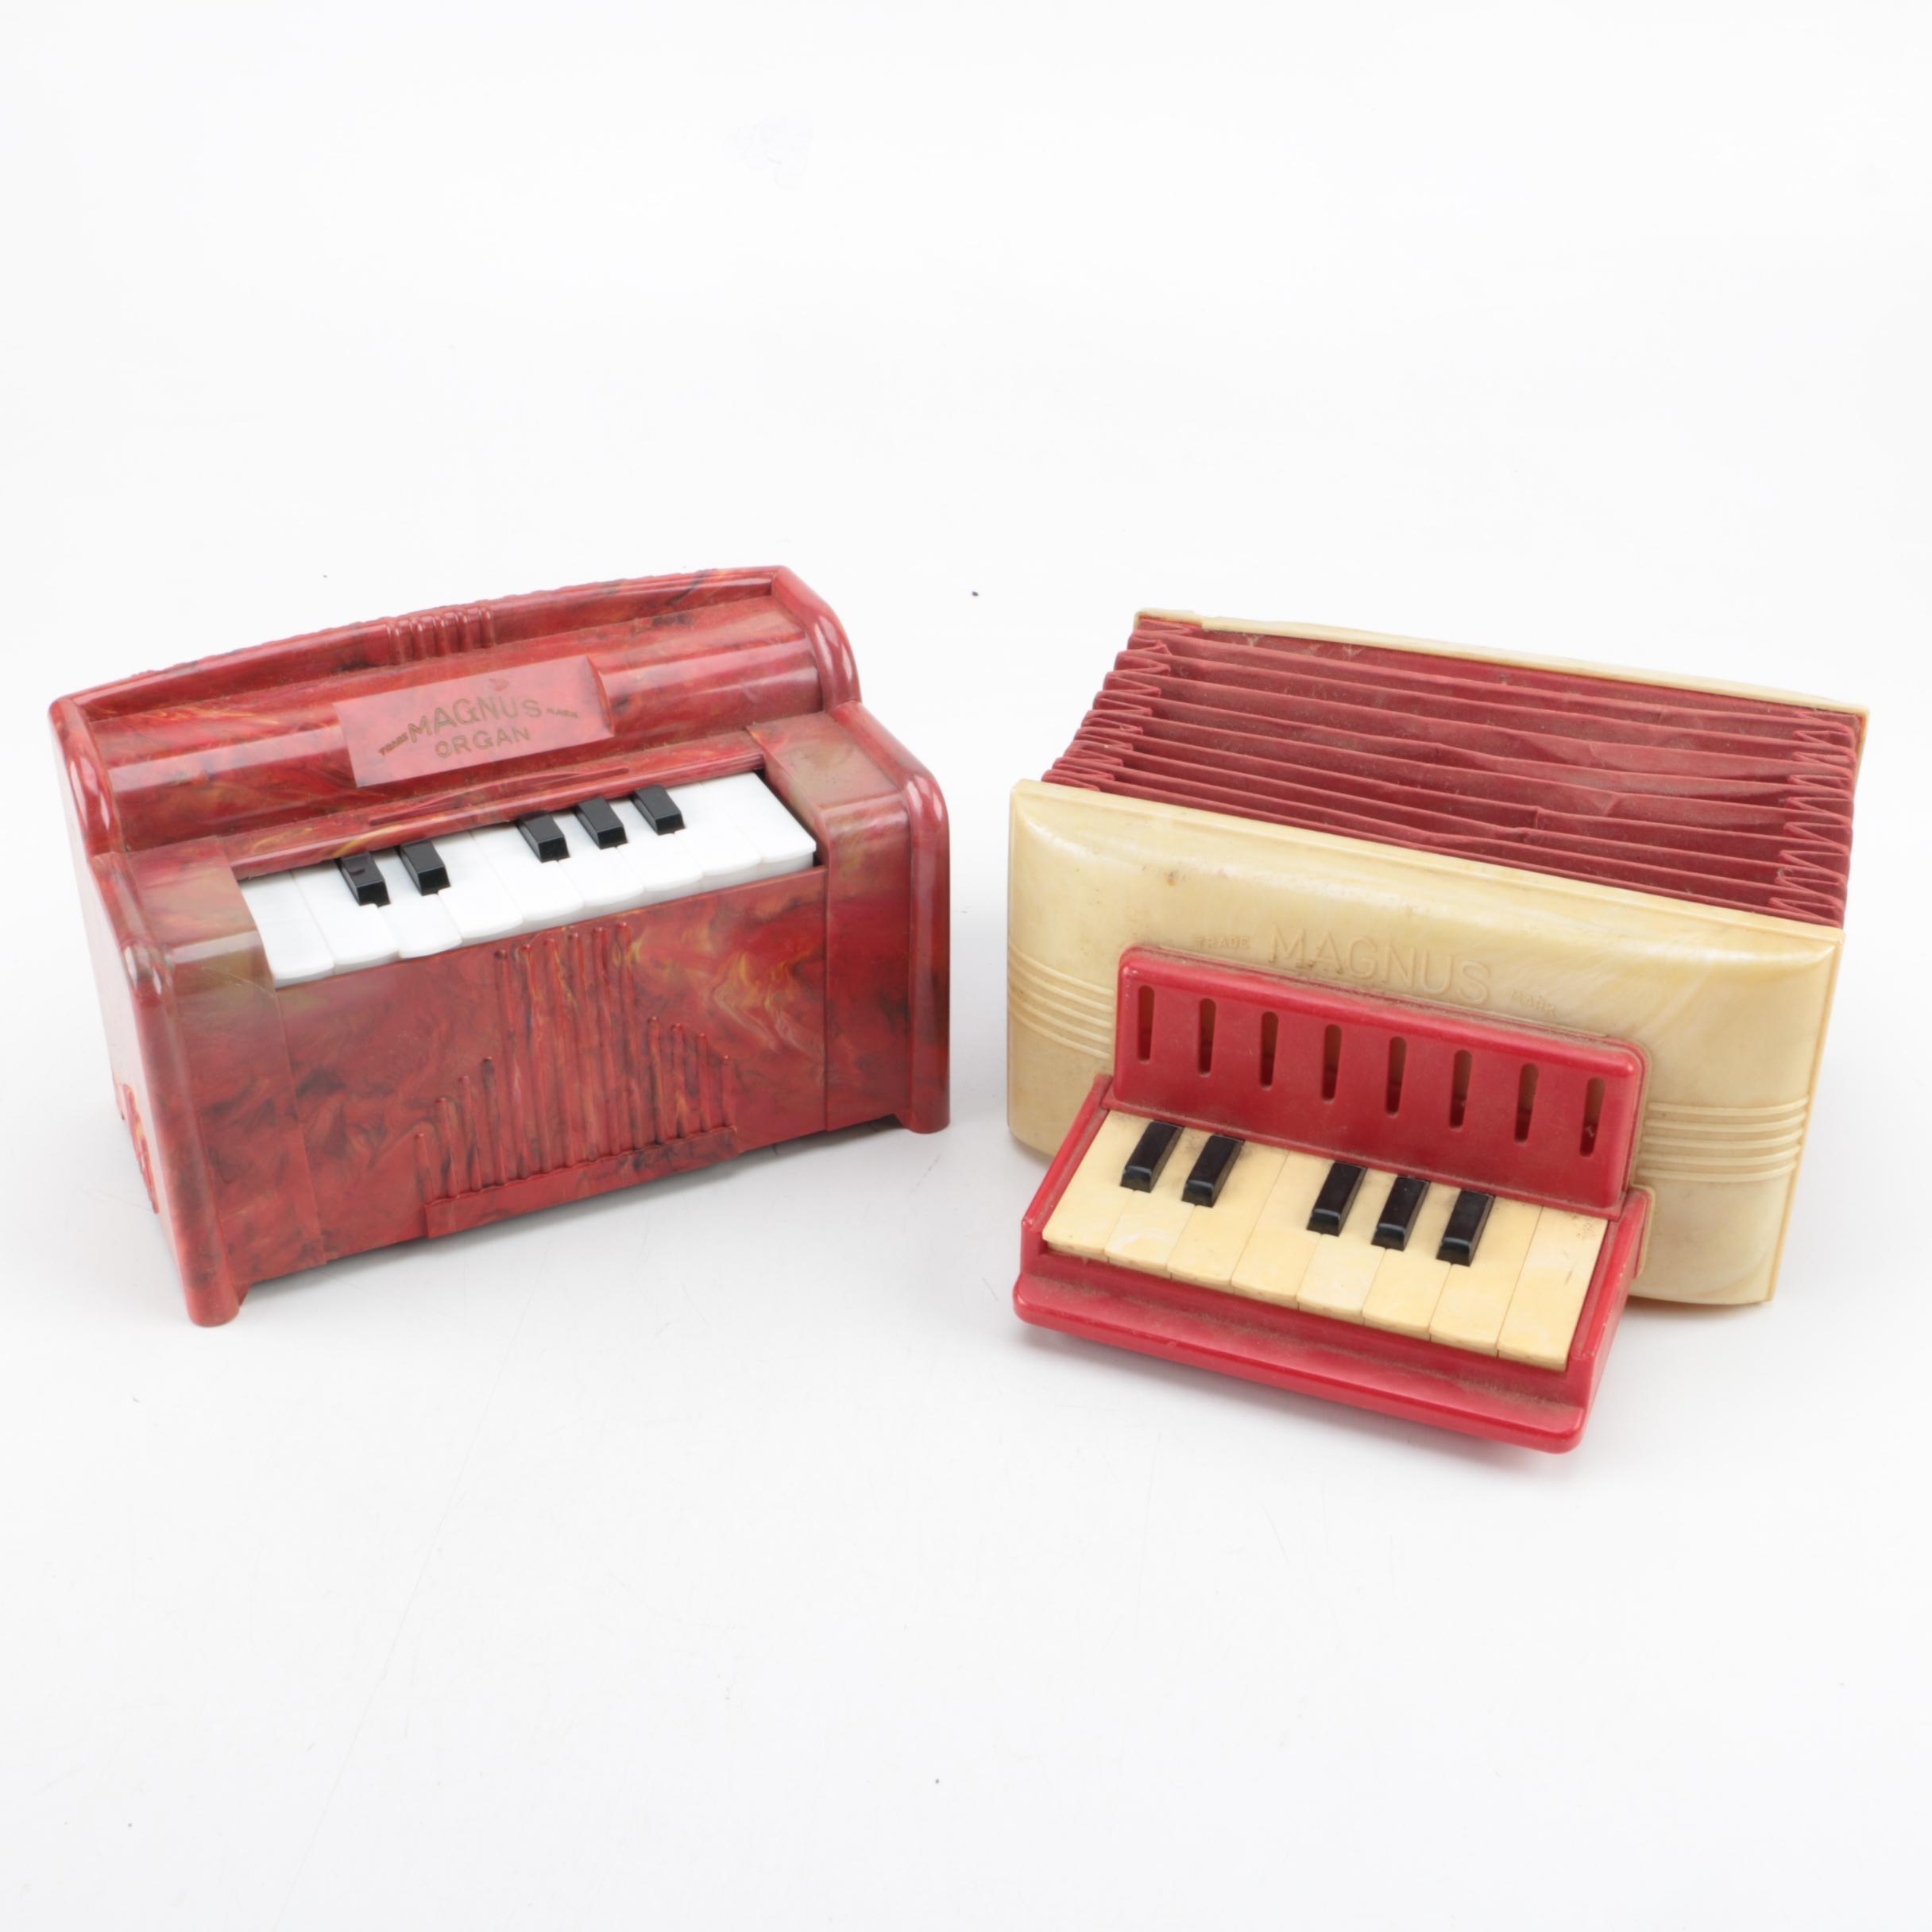 Vintage Magnus Super Blow Organ and Toy Accordion